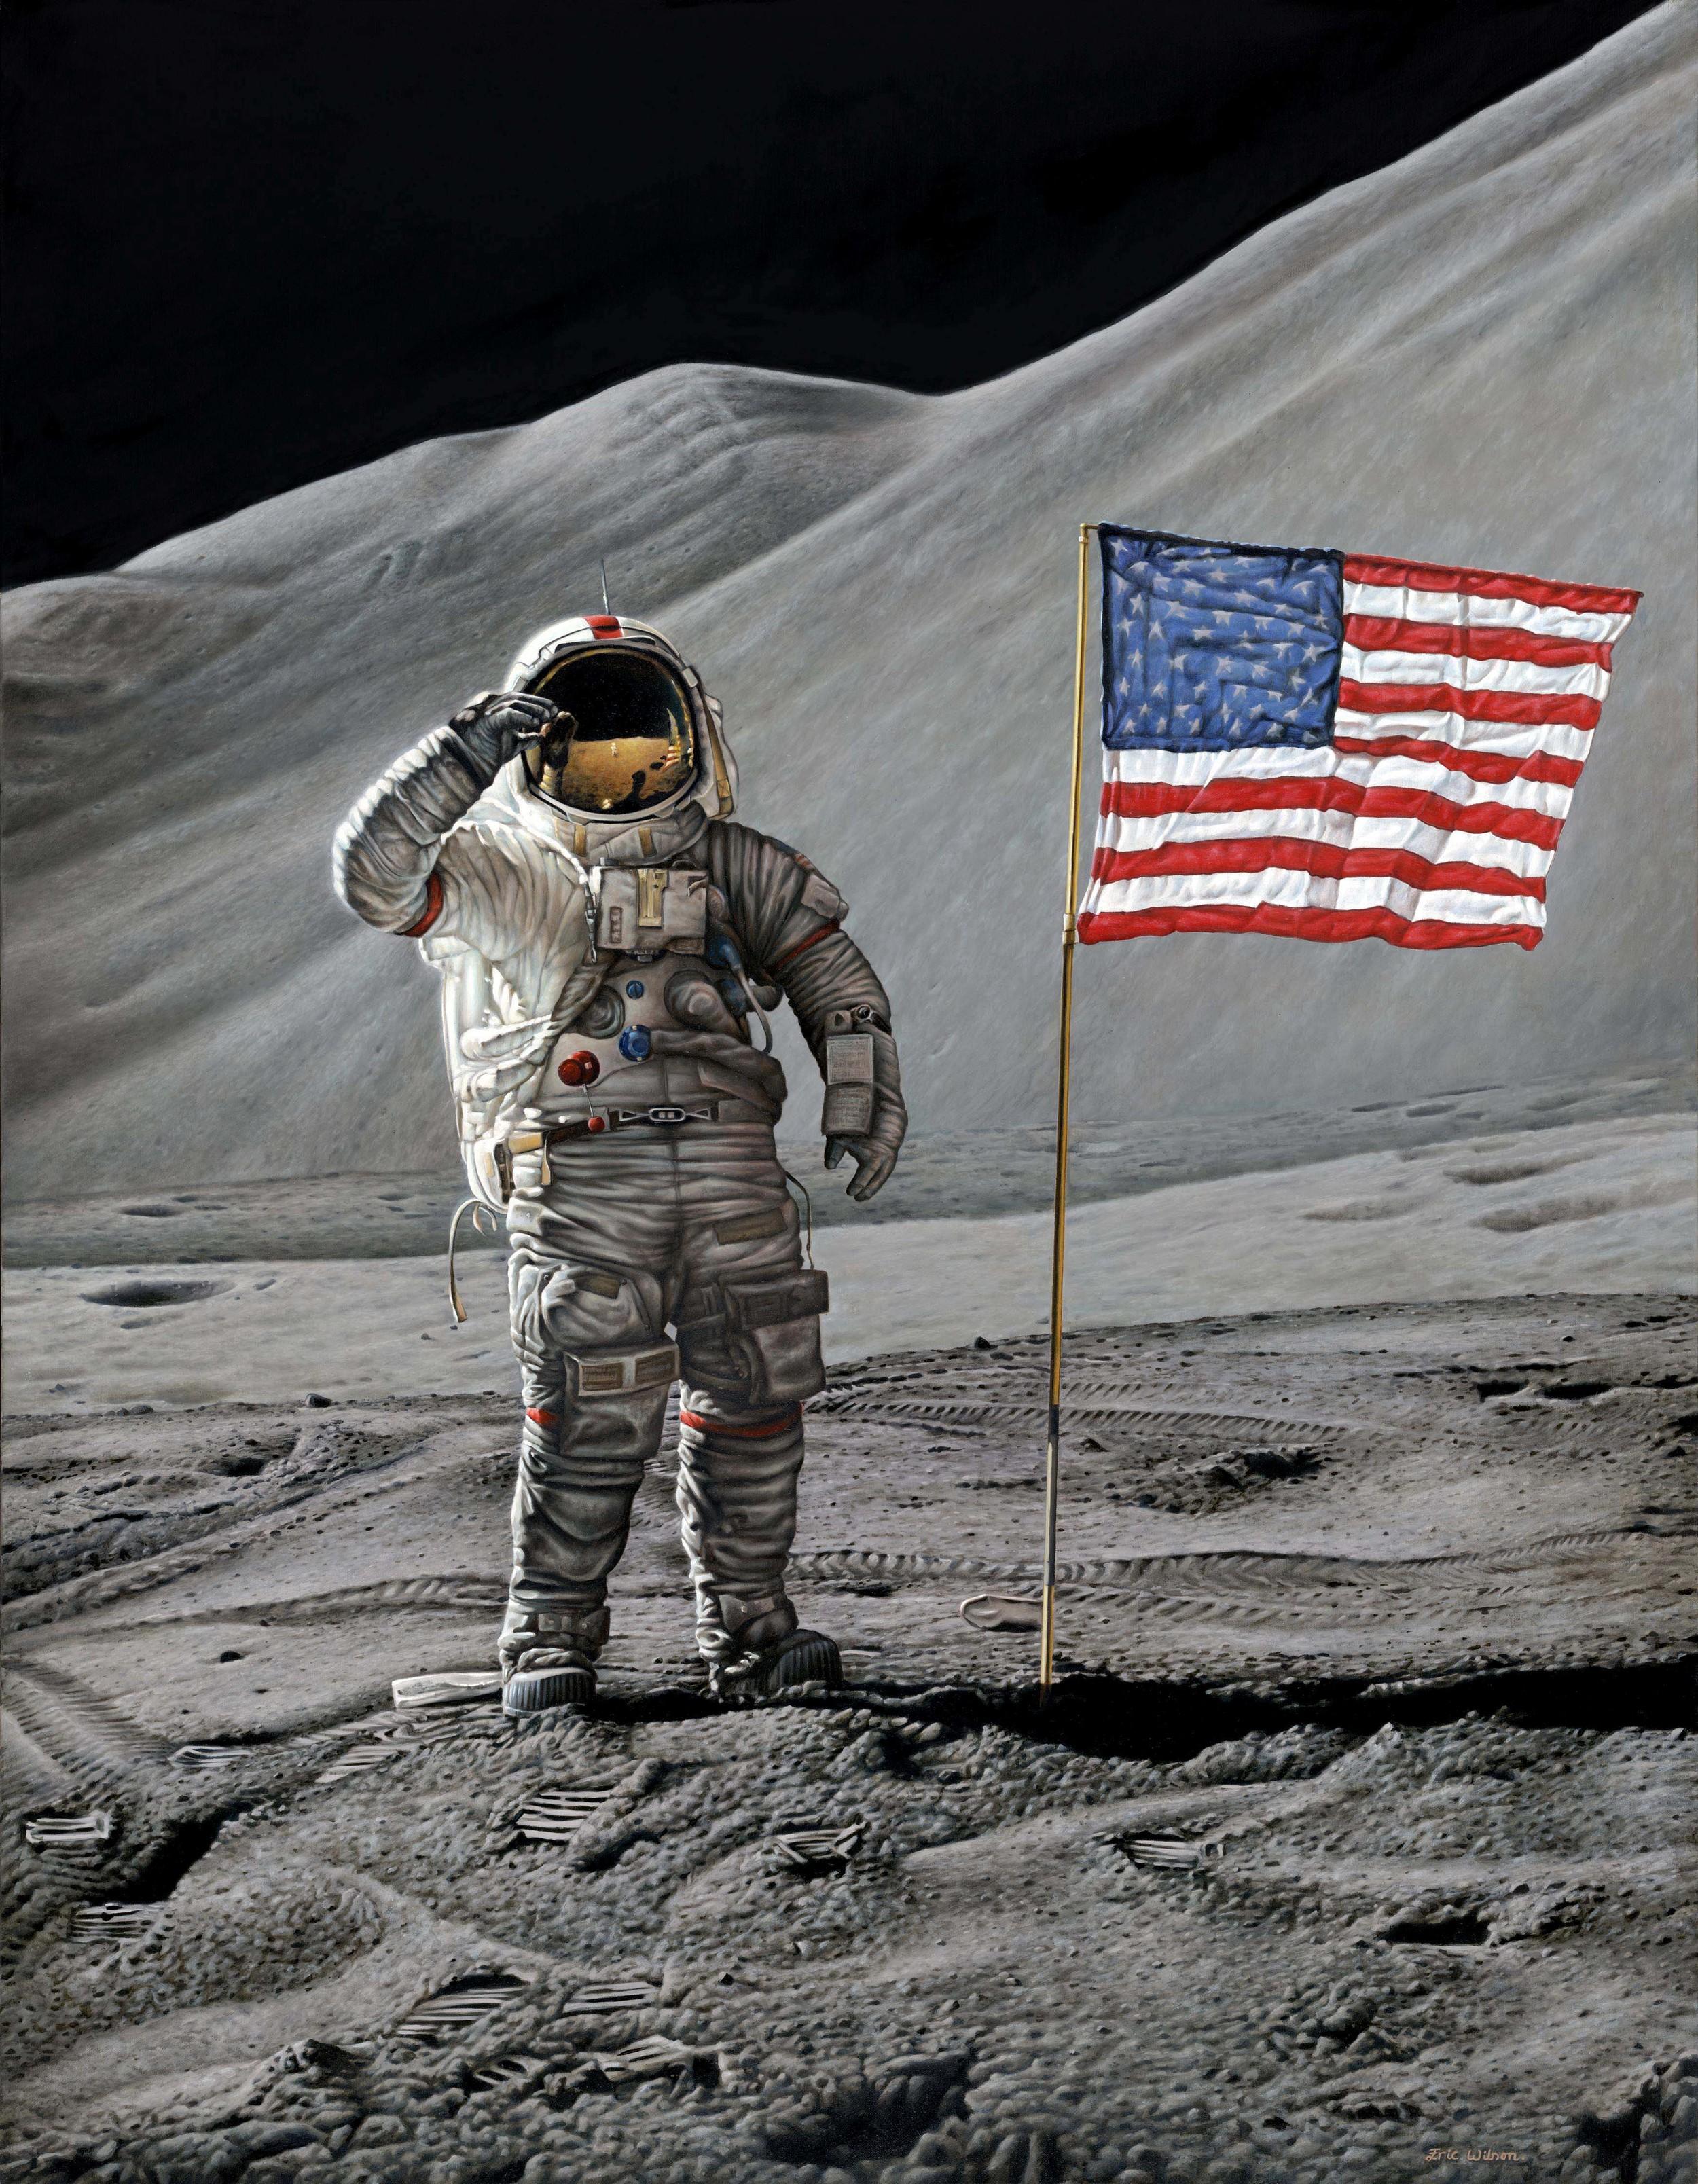 Apollo 15 commander David Randolf Scott at Hadley base on the moon during the Apollo 15 mission.